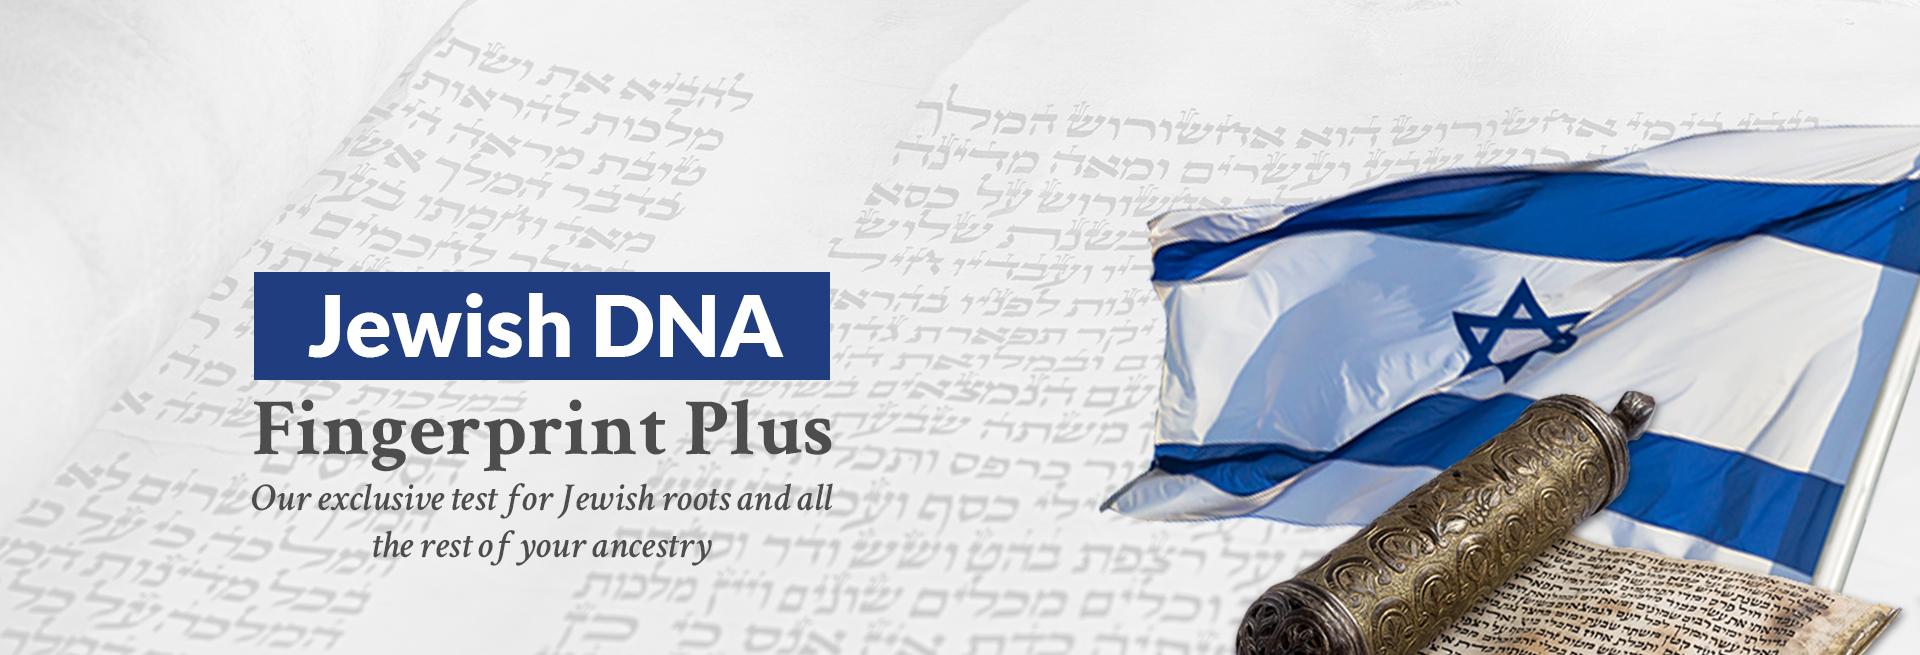 Jewish DNA Fingerprint Plus